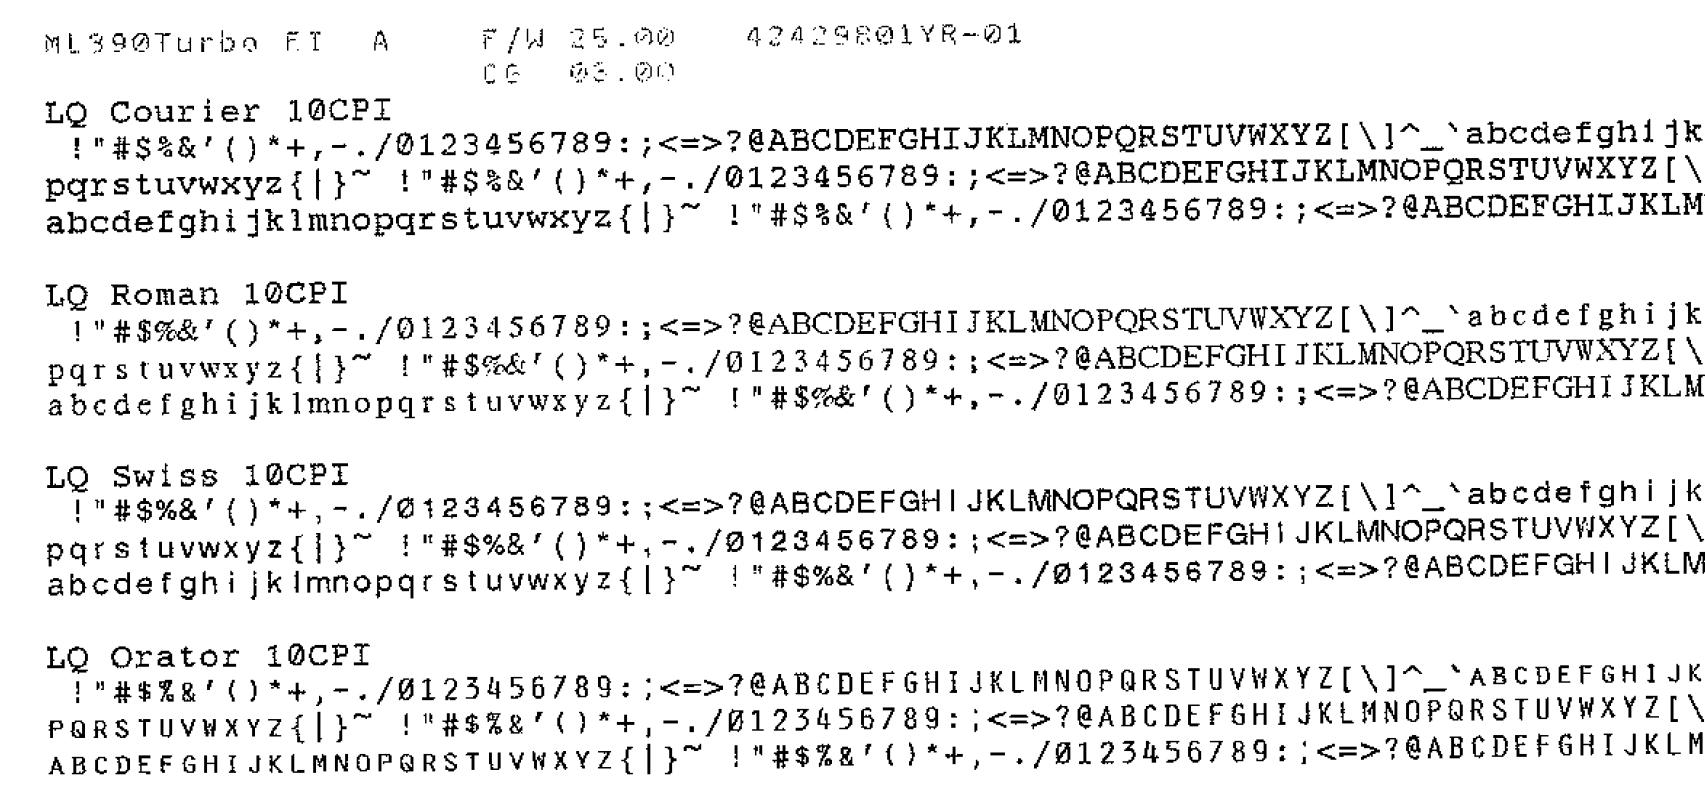 Dot Matrix Printer Not Printing Correctly